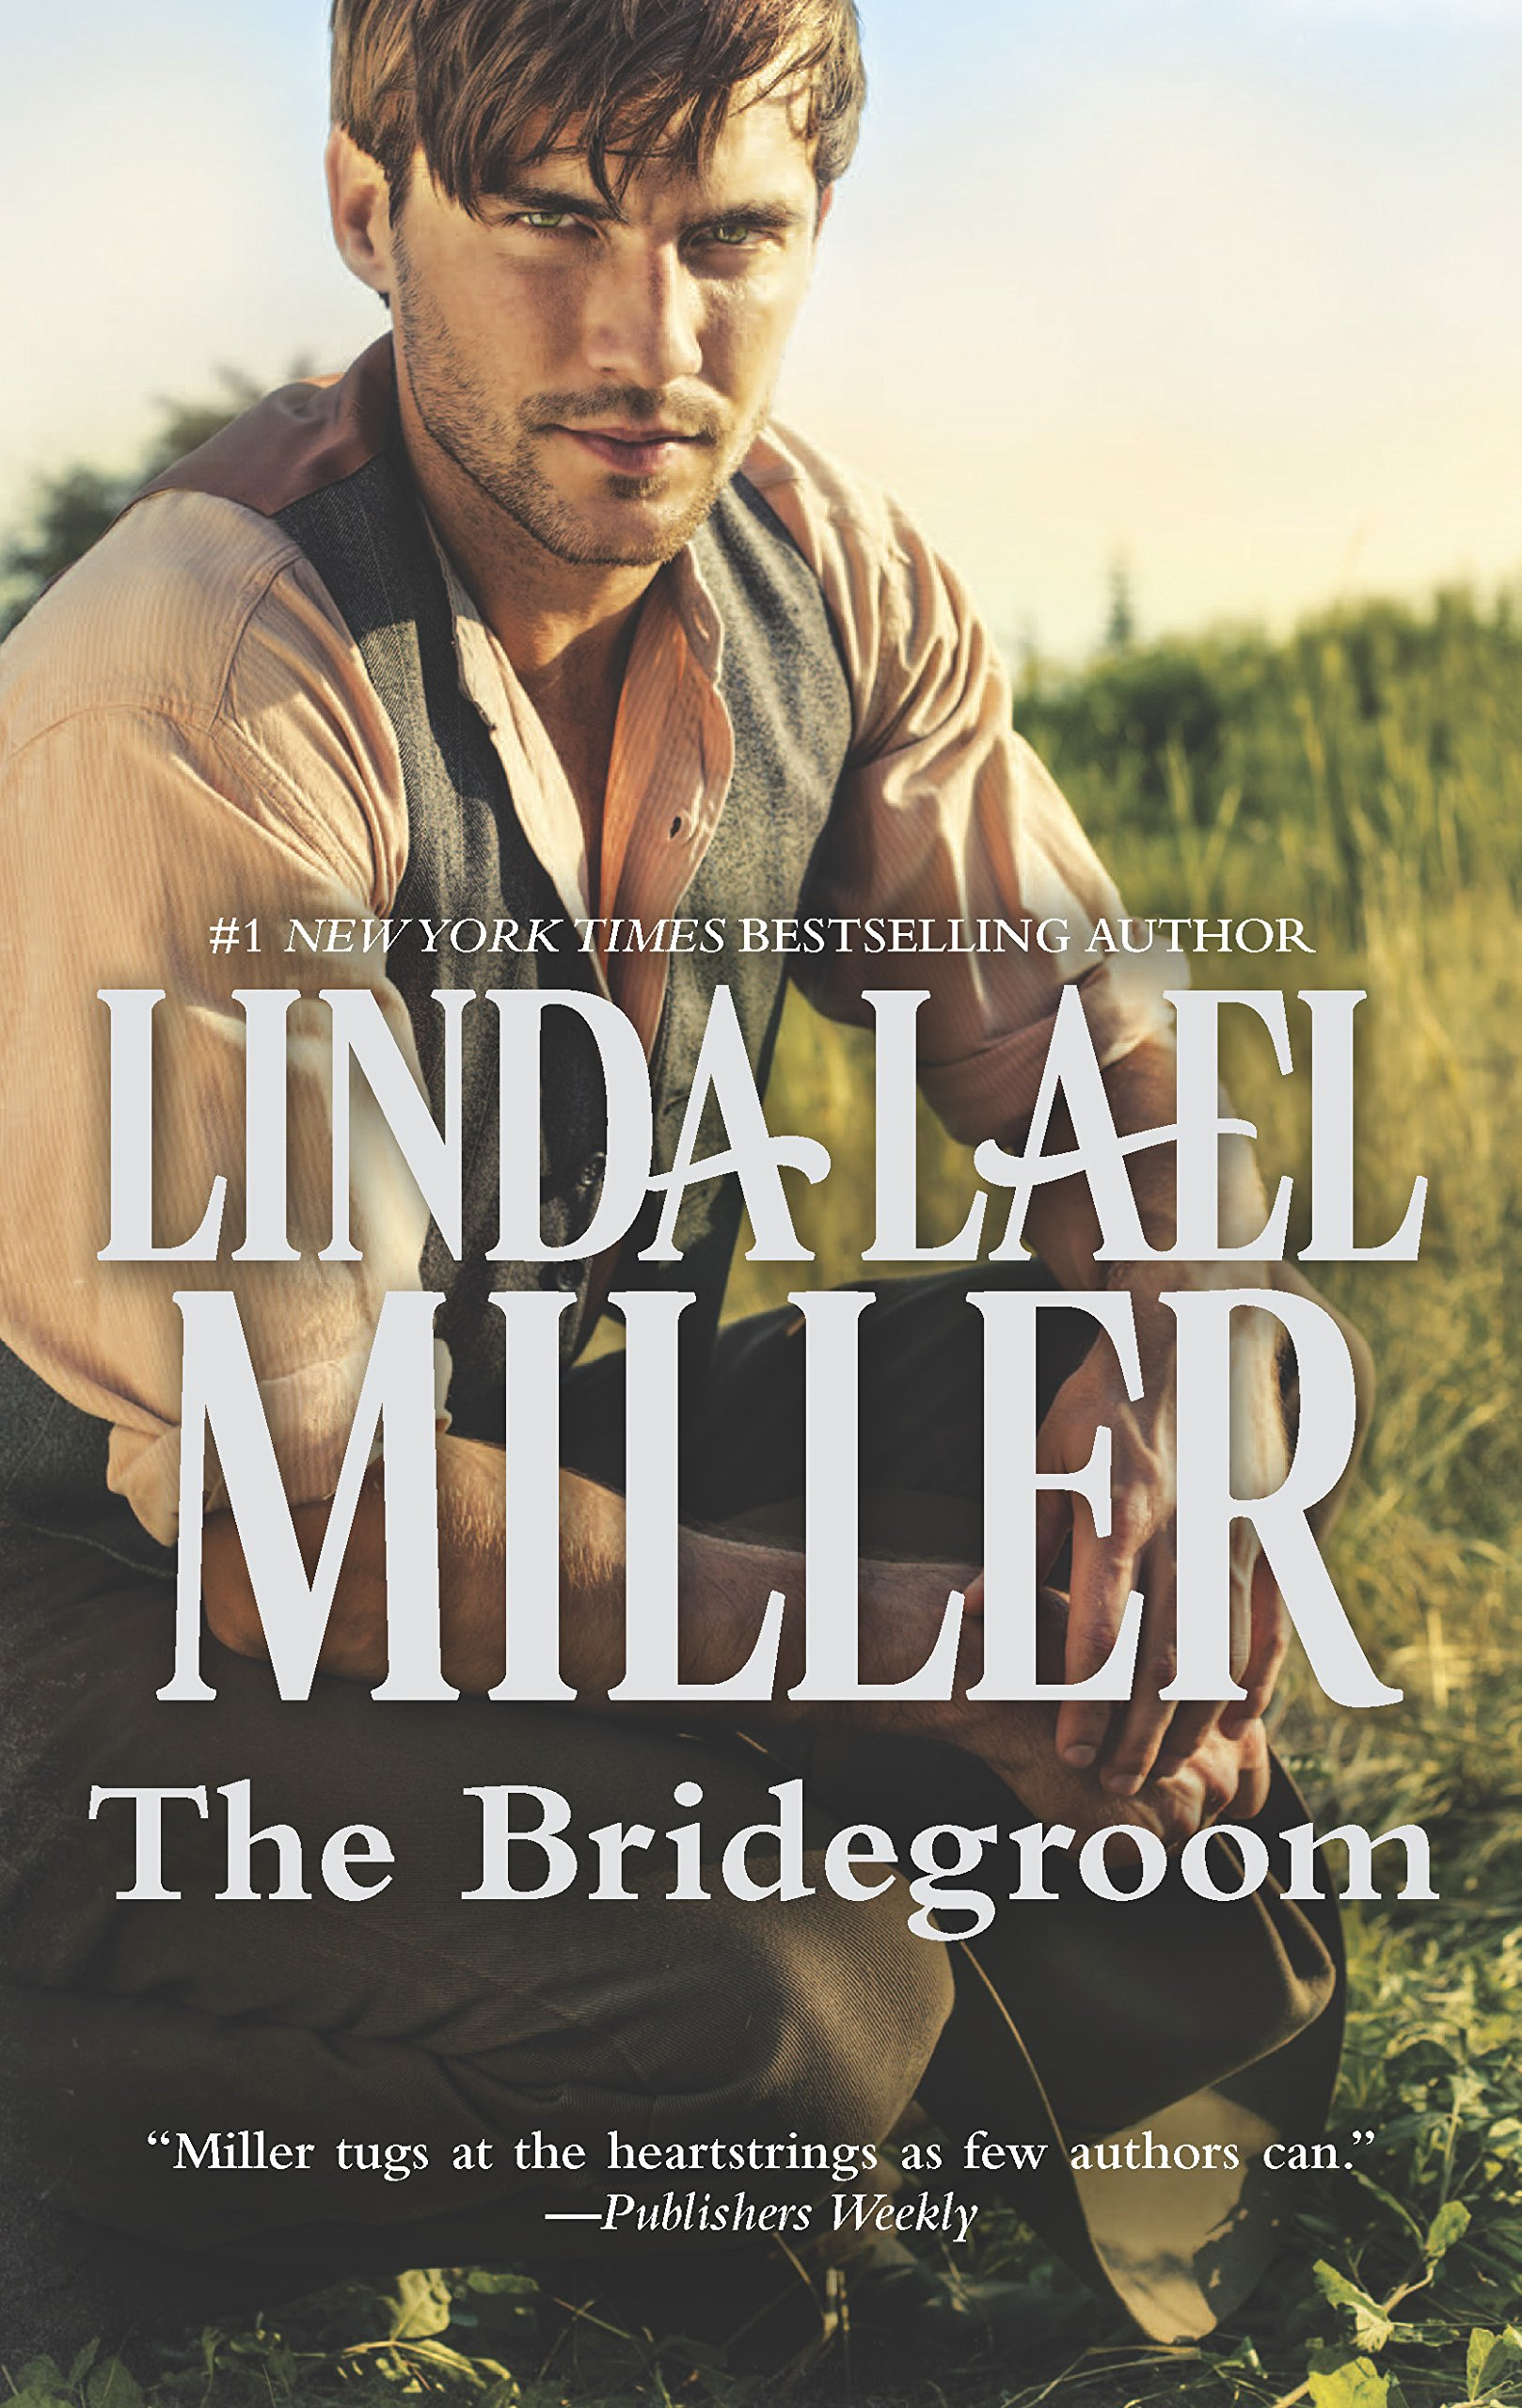 A Wanted Man: A Stone Creek Novel (Mills & Boon M&B) (A Stone Creek Novel, Book 2)